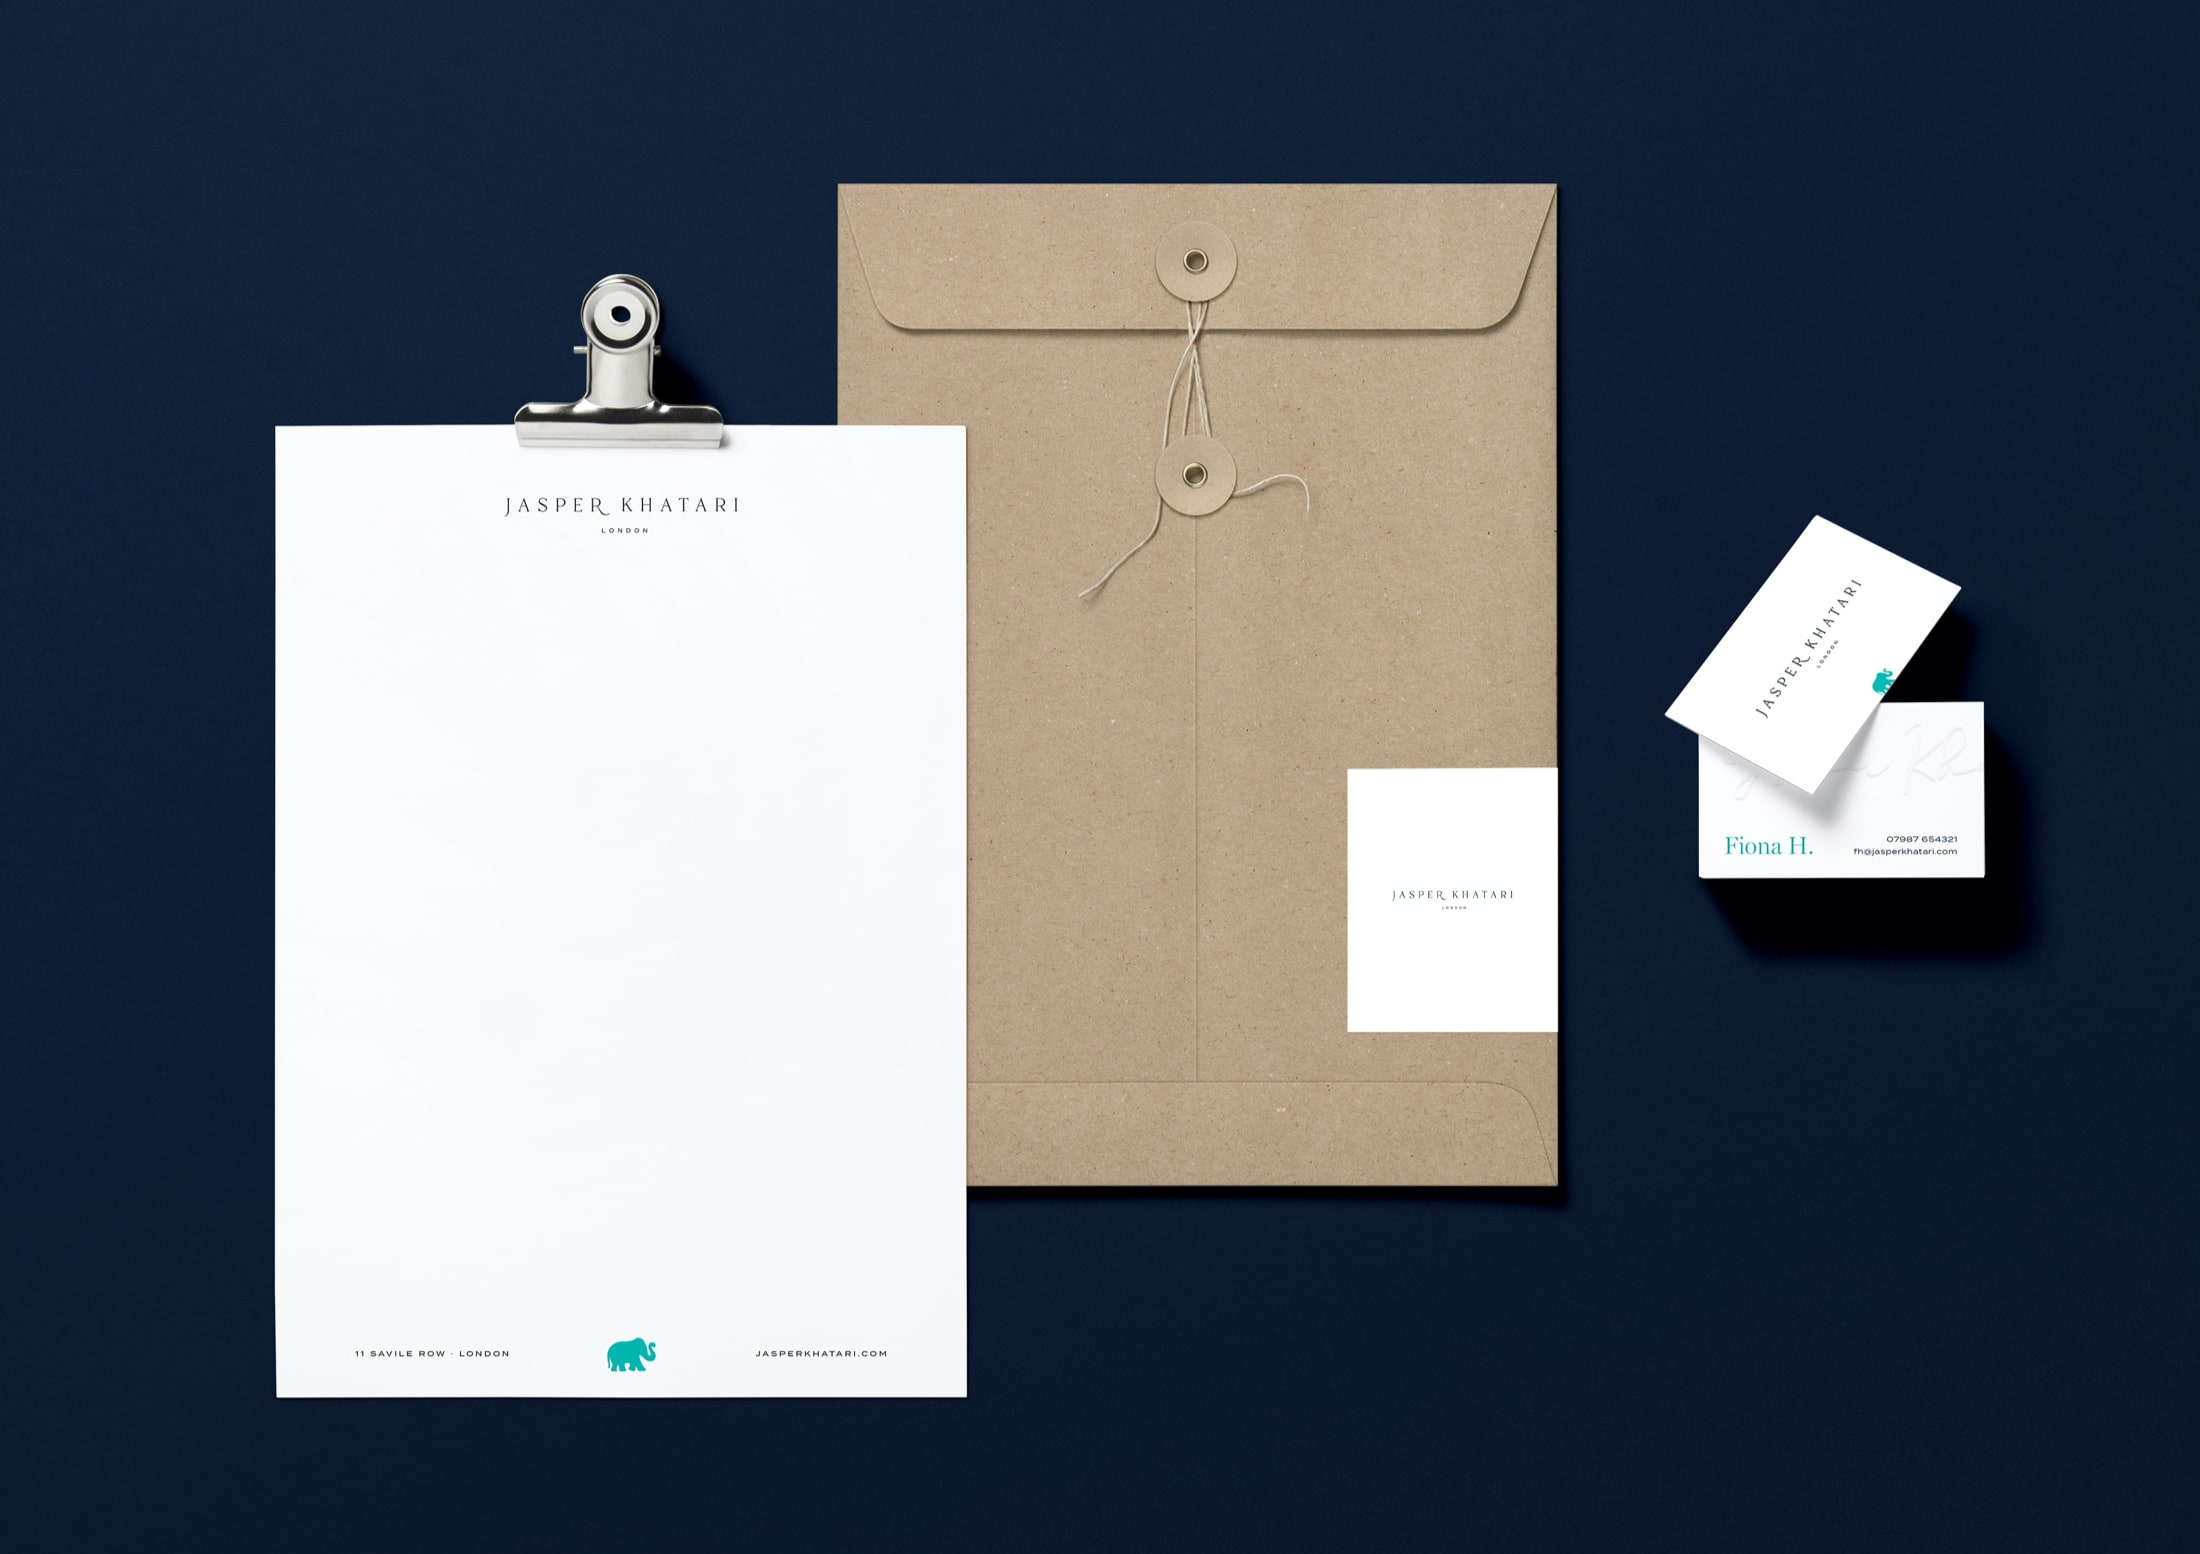 Business stationery, letterhead, envelope and business card design for Savile Row, Jasper Khatari